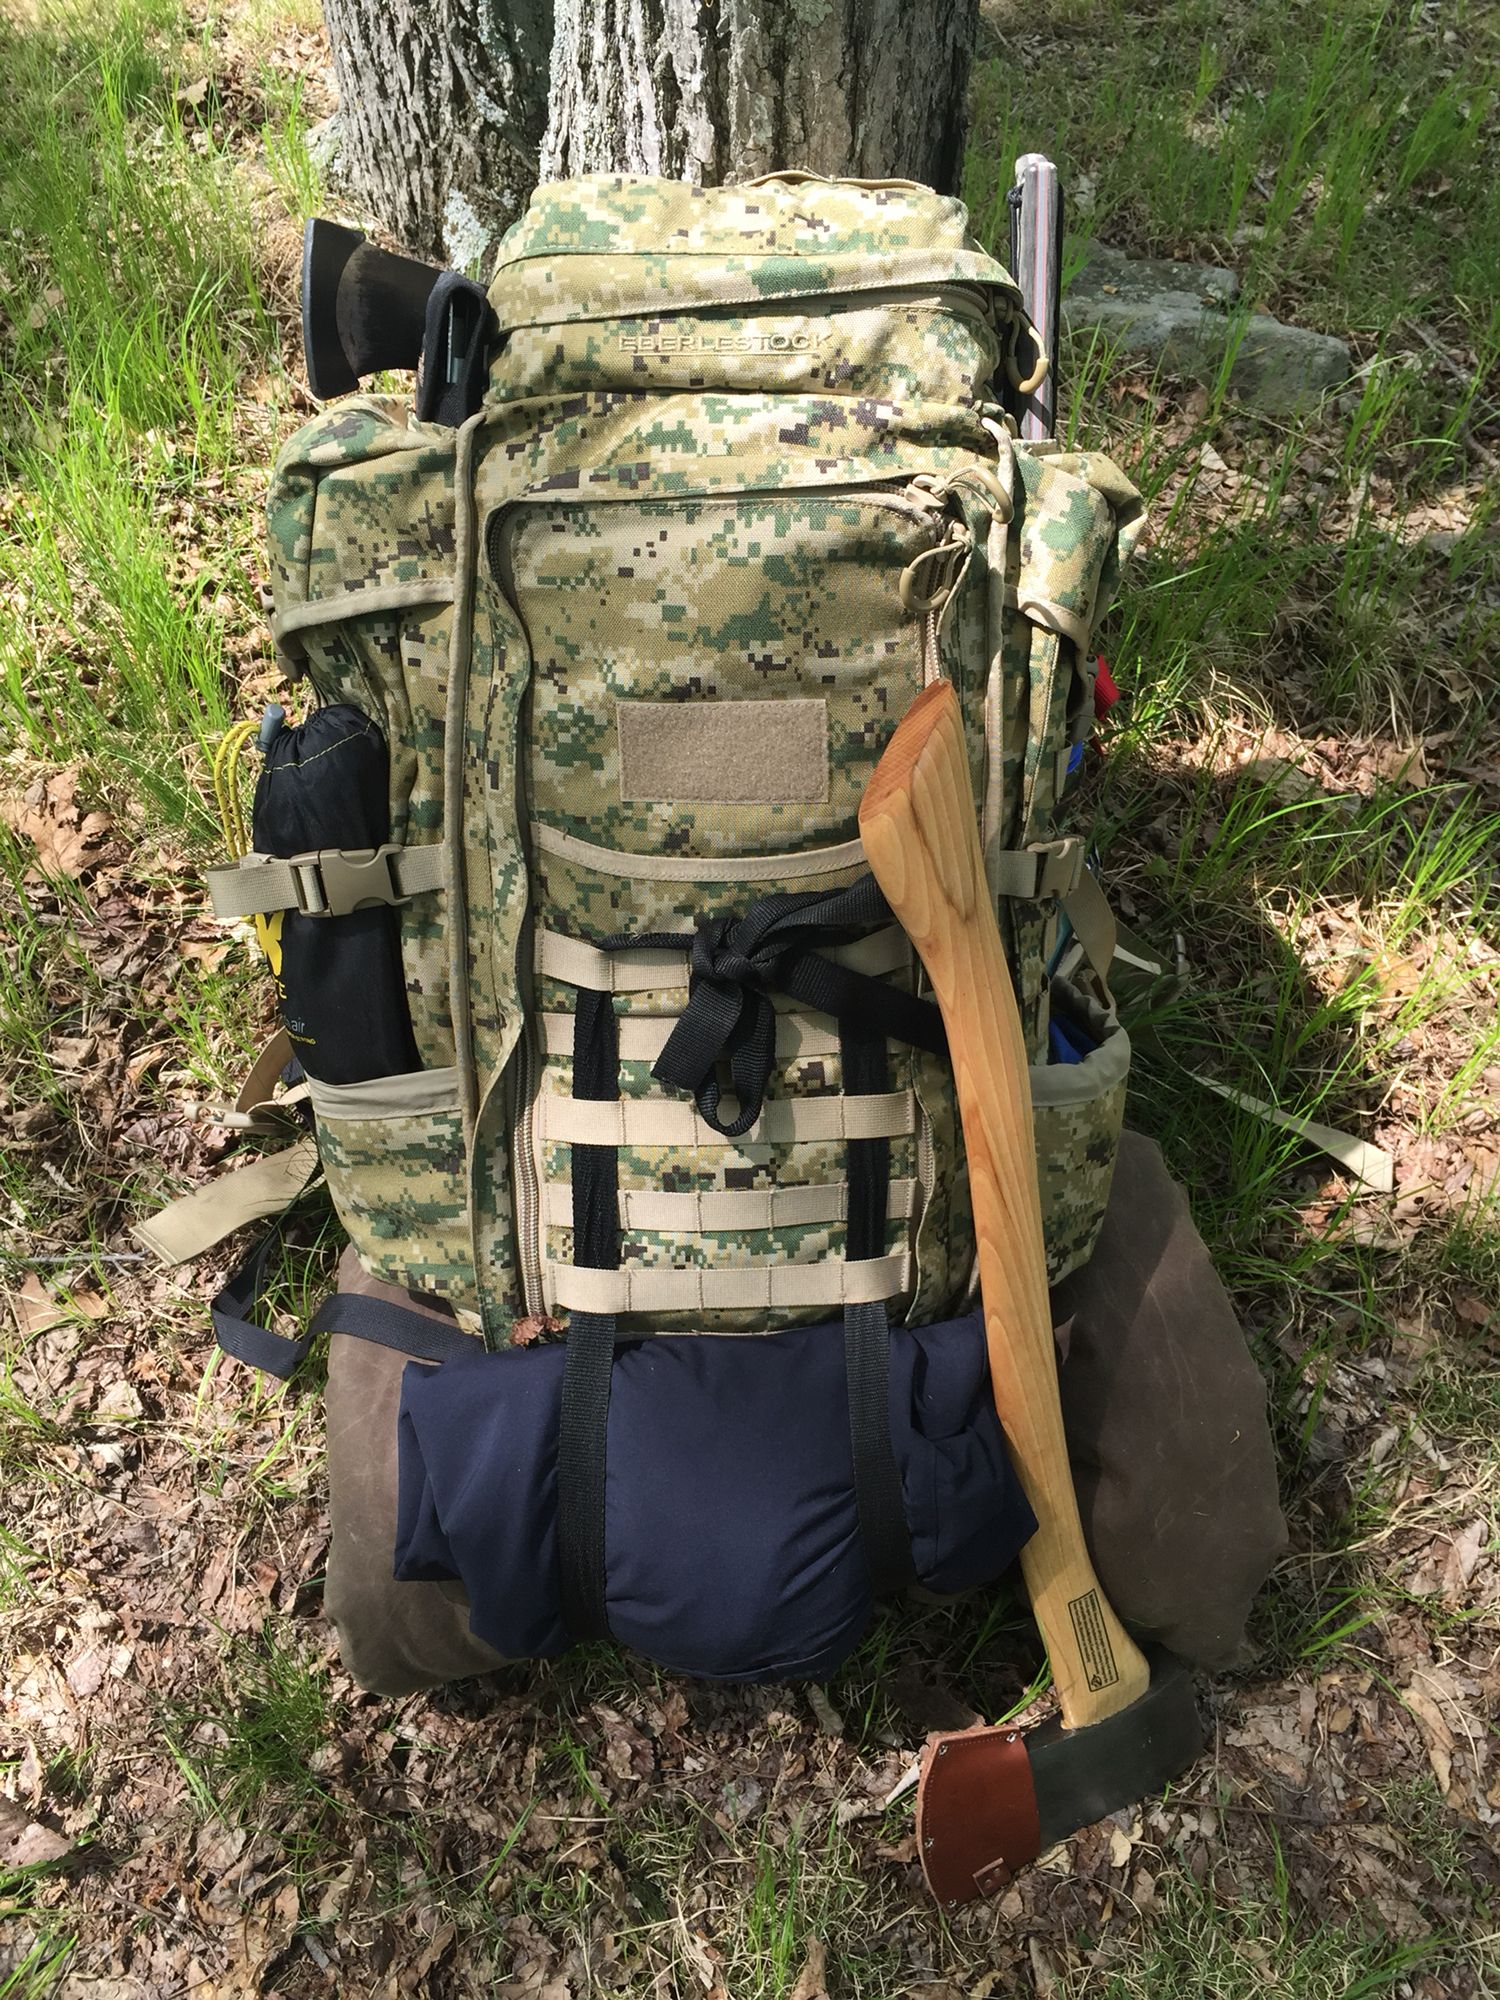 My Tactical Bushcraft Bag Halftrack By Eberlestock